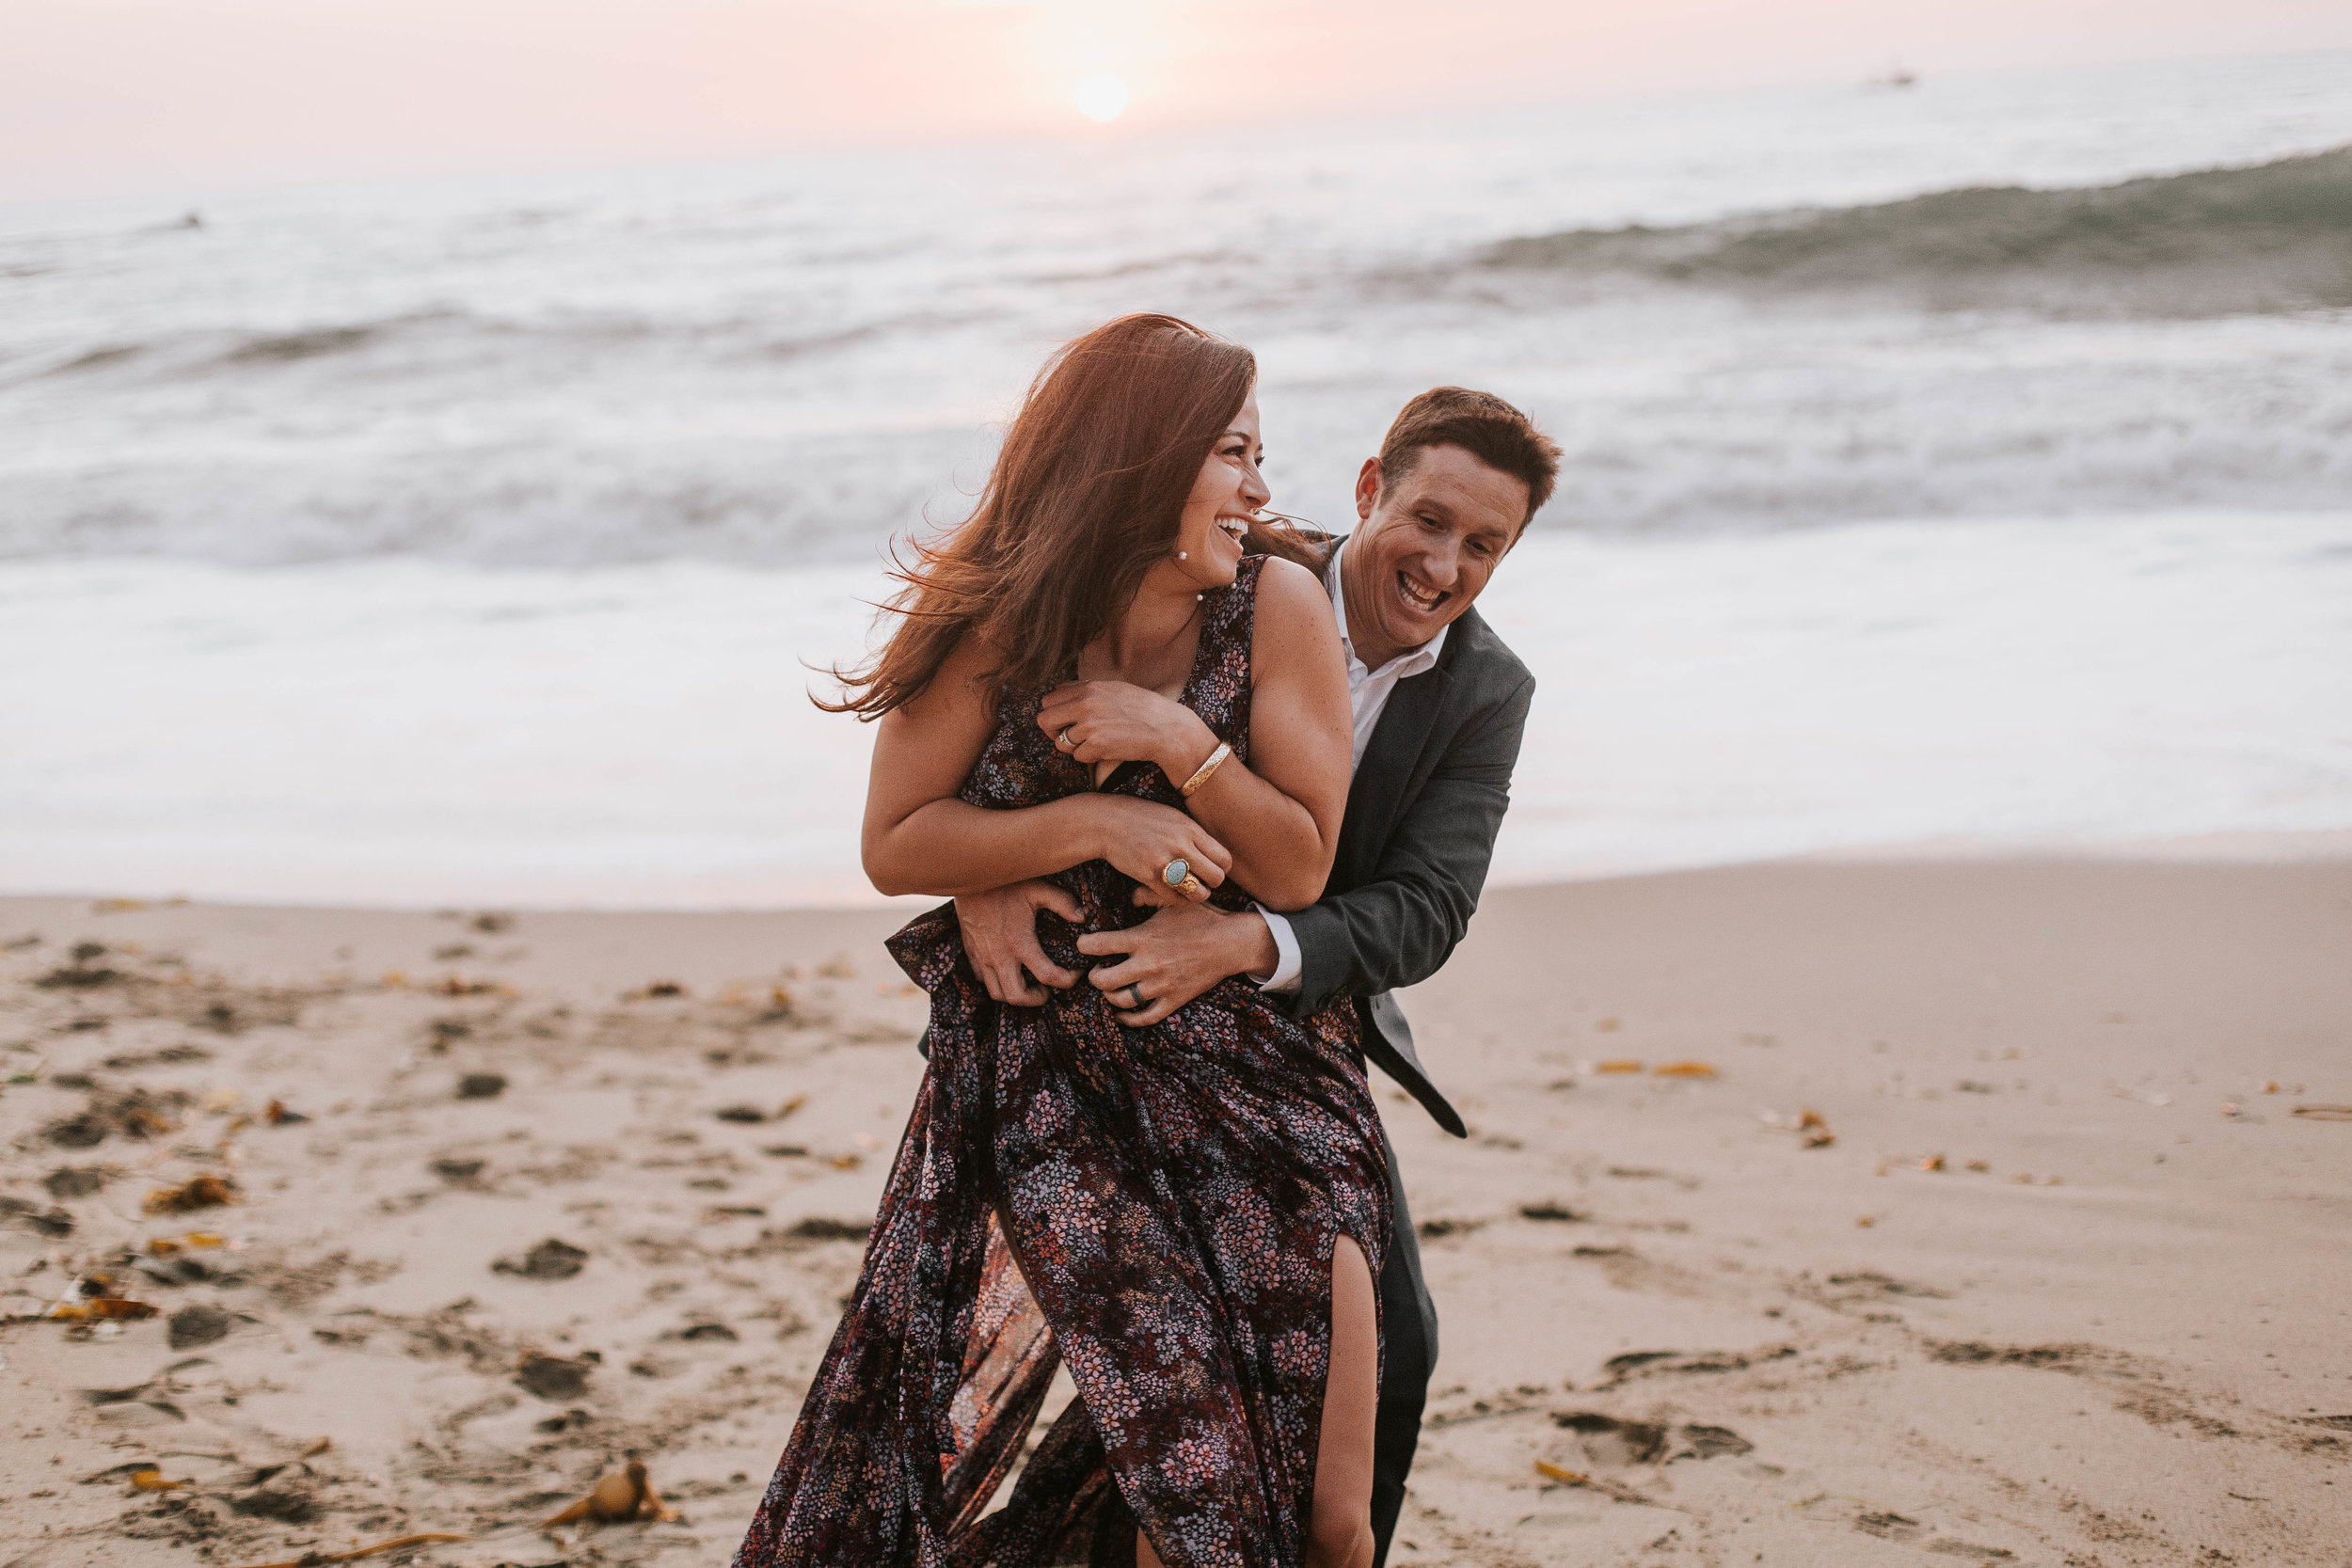 nicole-daacke-photography-big-sur-california-coast-adventure-engagement-photos-adventurous-elopement-intimate-wedding-photographer-golden-coastal-cali-engagement-session-28.jpg